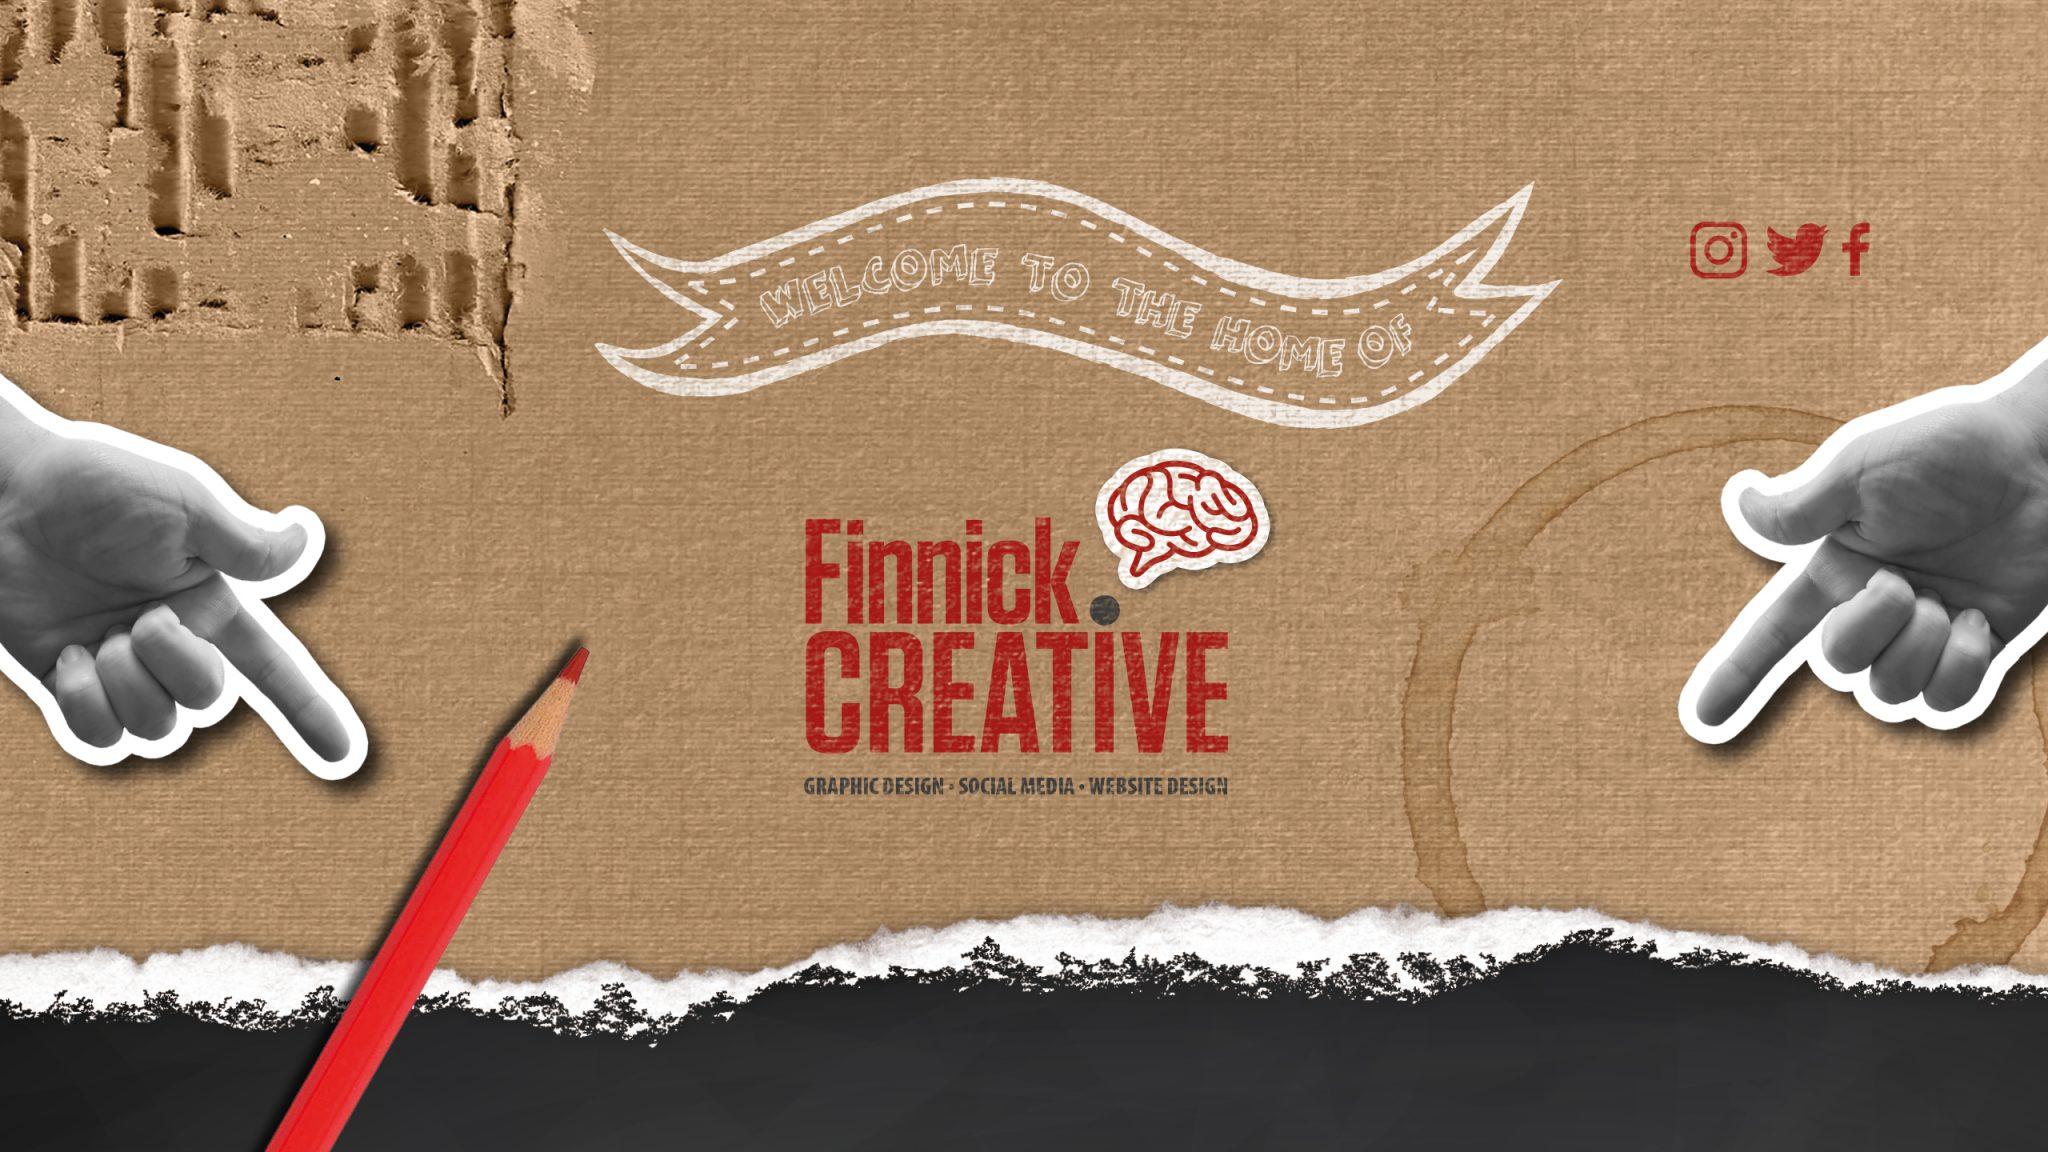 Finnick Creative Graphic Design Cheltenham Web Design Social Media